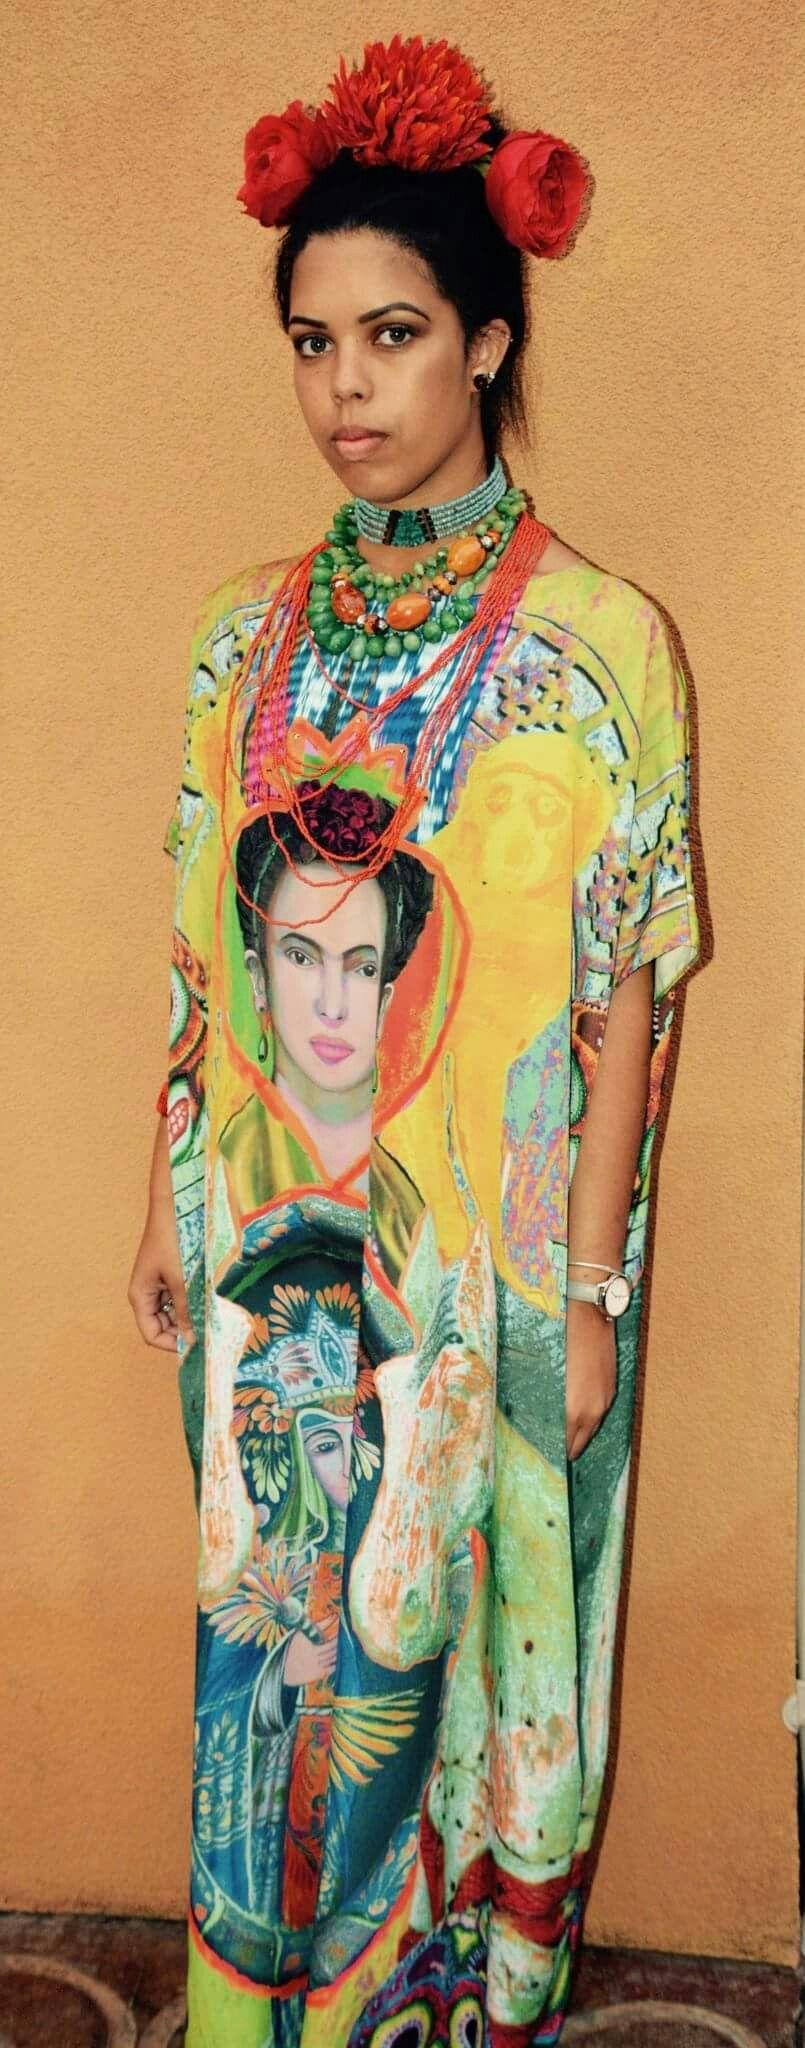 Anelia Art Fashion Designer Designed By Anelia Made In Canada Fashion Art Fashion Design Fashion